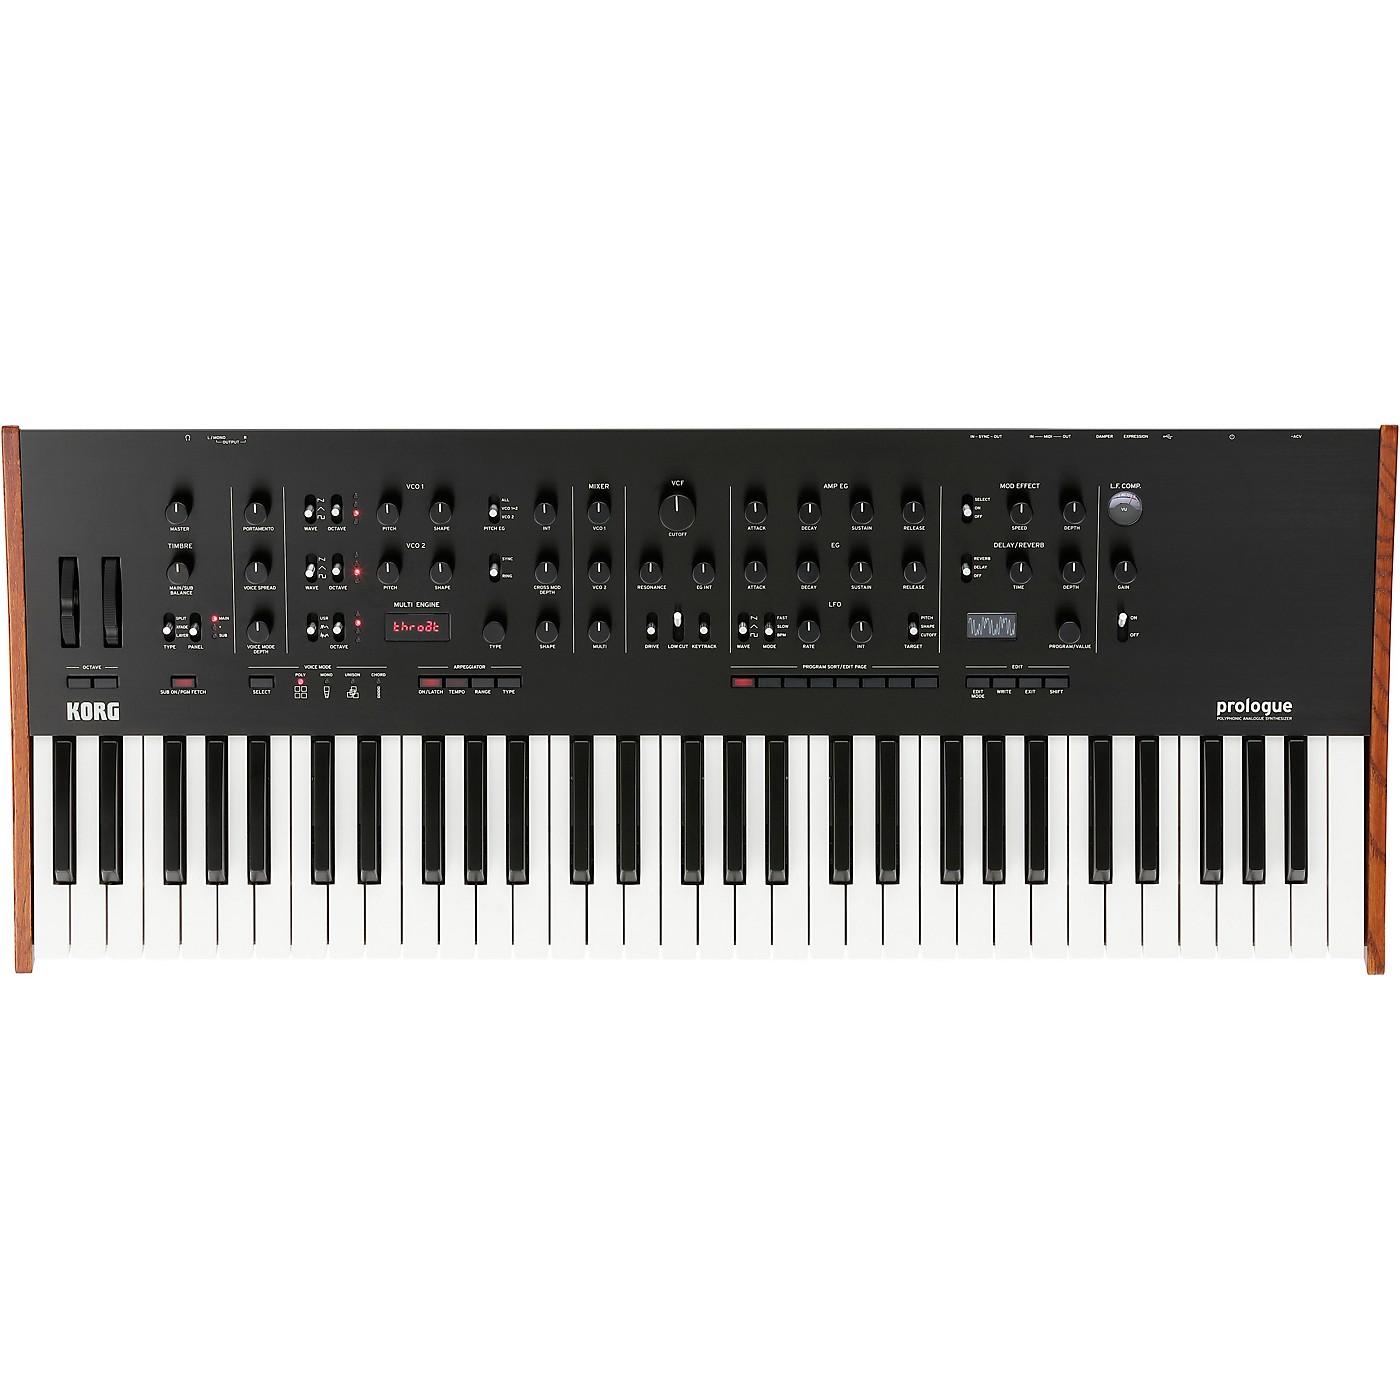 Korg Prologue 16-Voice Polyphonic Analog Synthesizer thumbnail